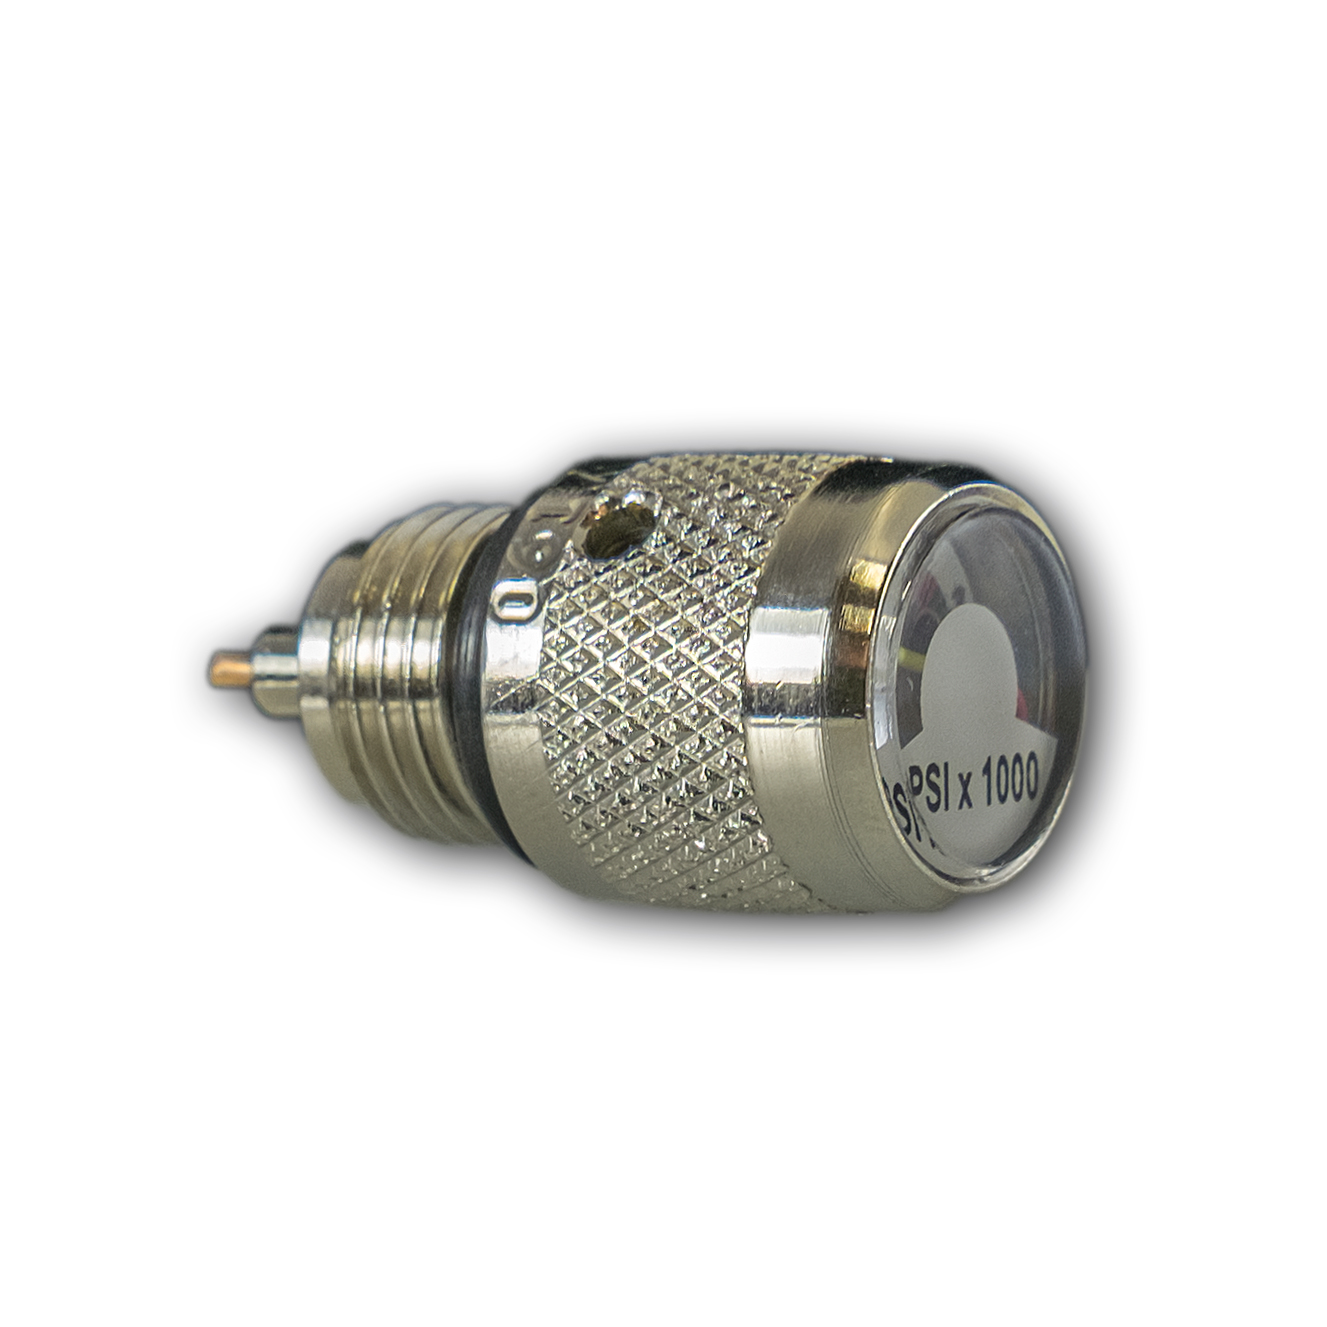 Nautec Analog-Manometer für Spare Air